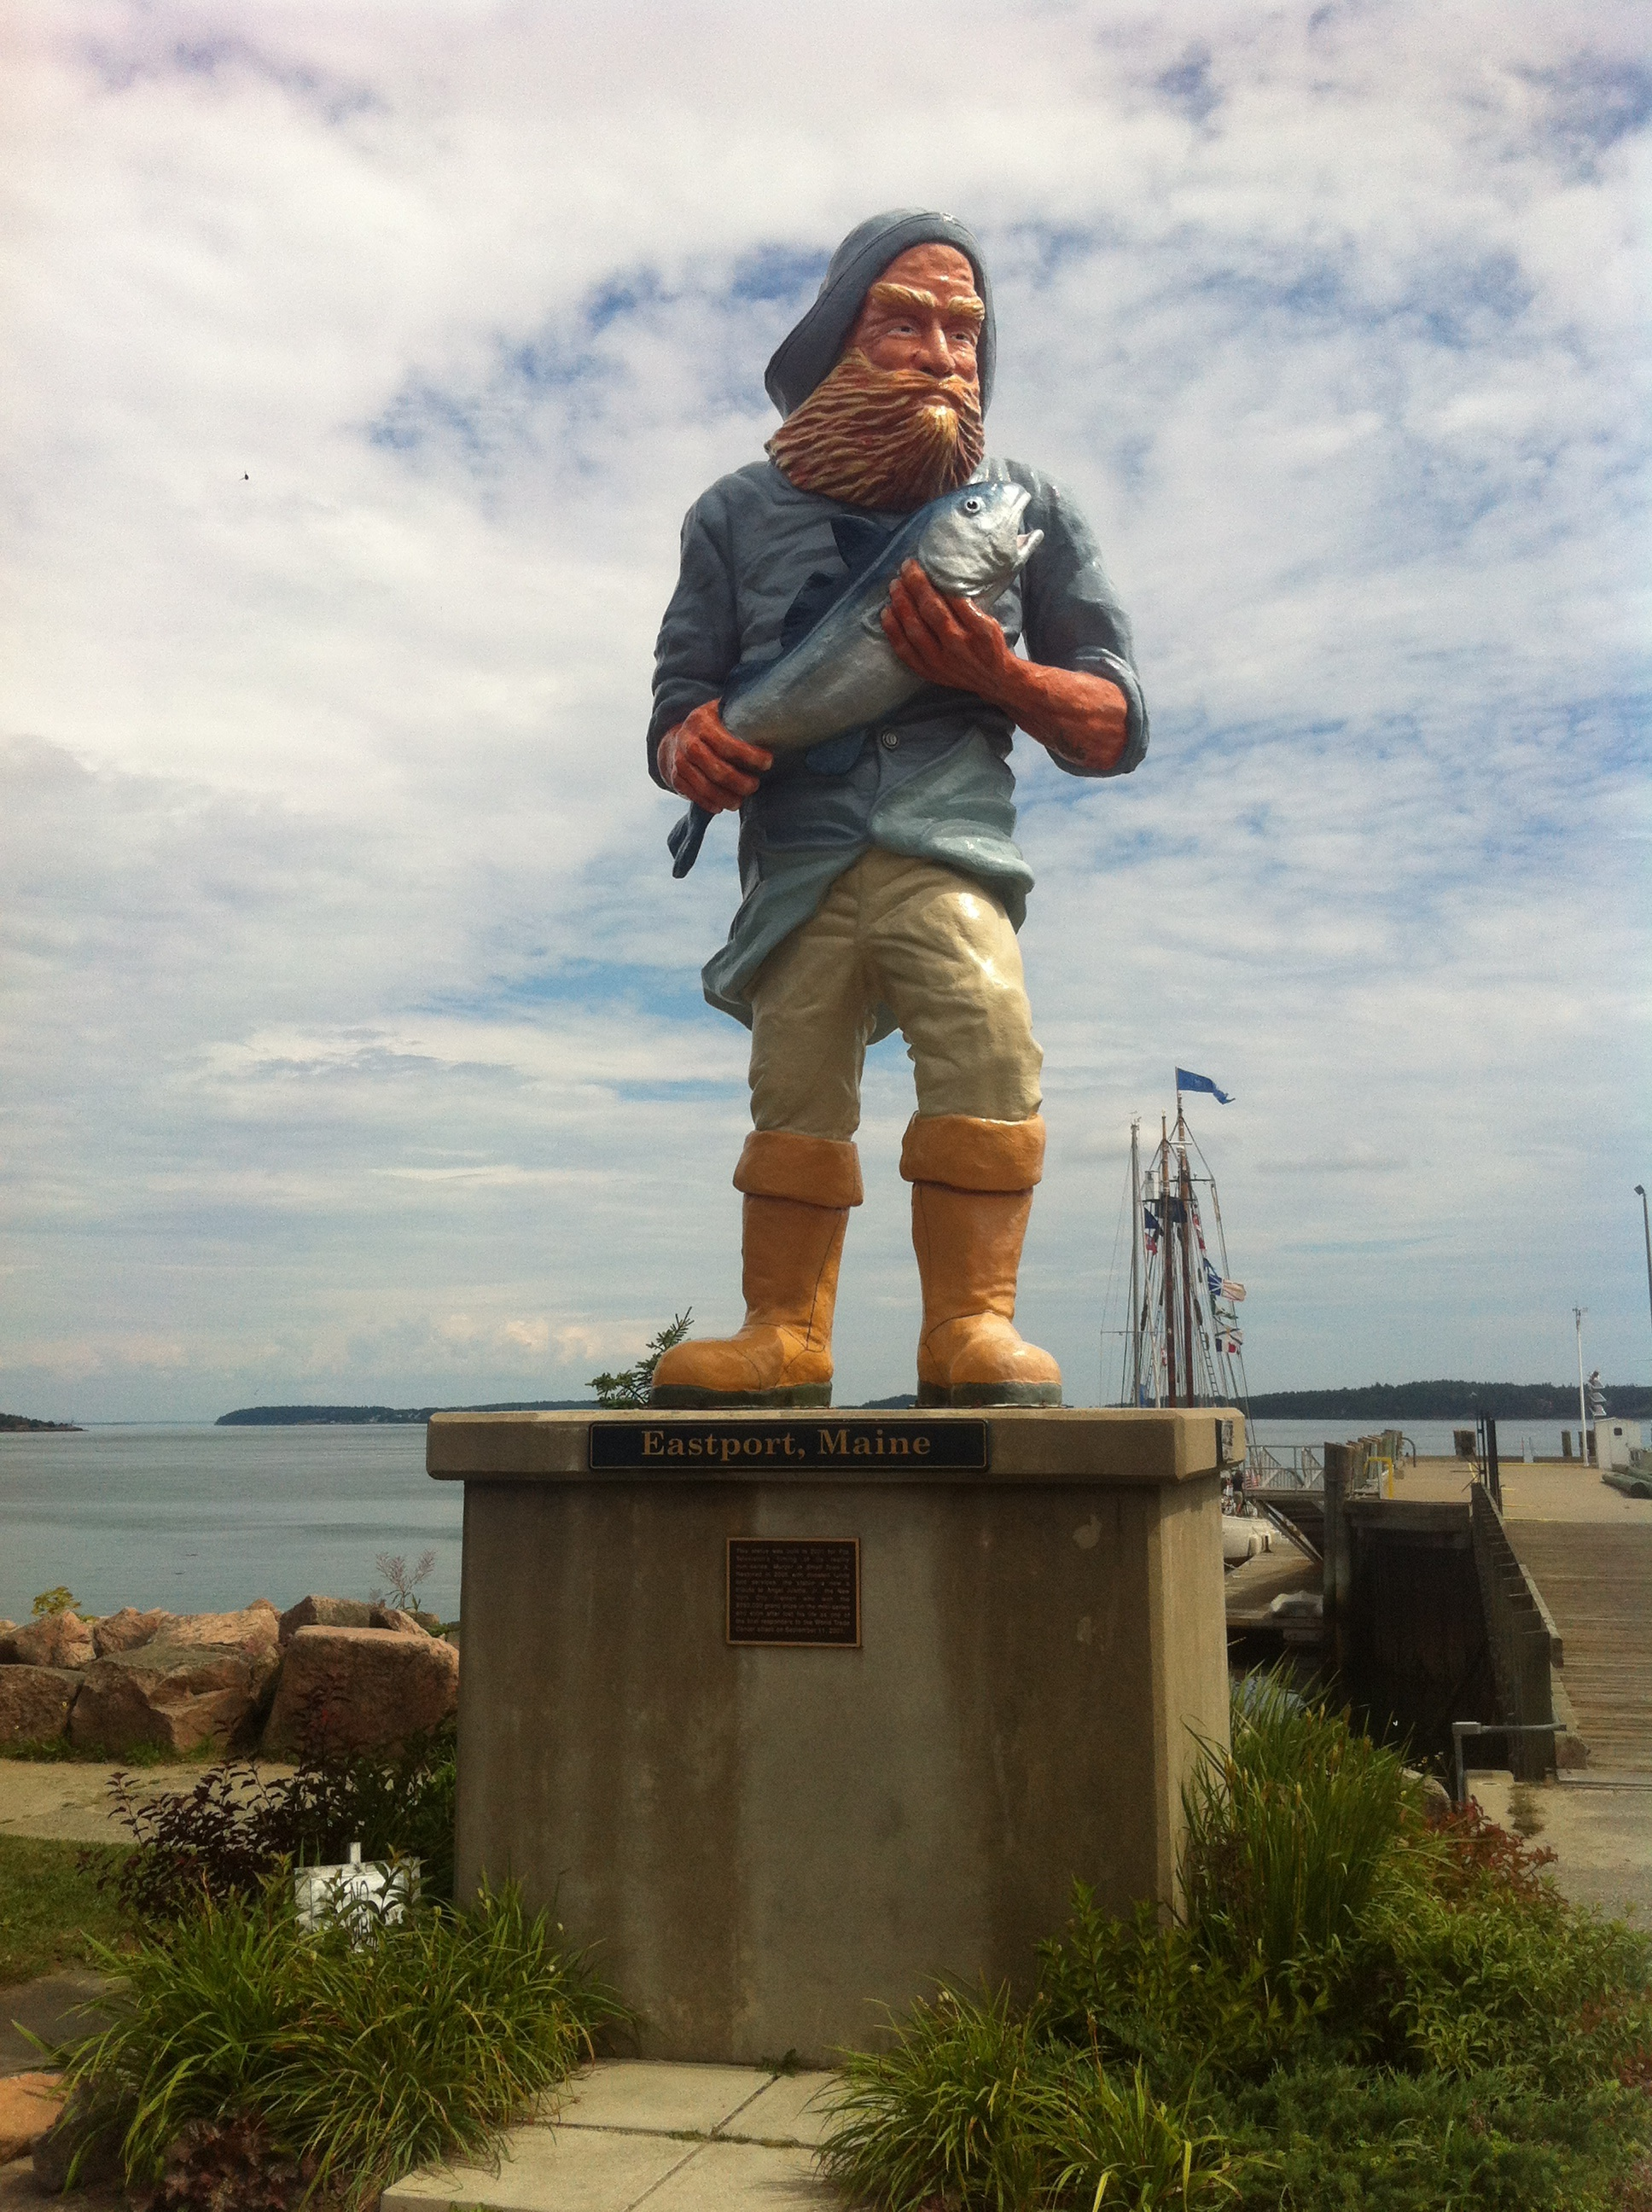 Fisherman Statue eastport maine